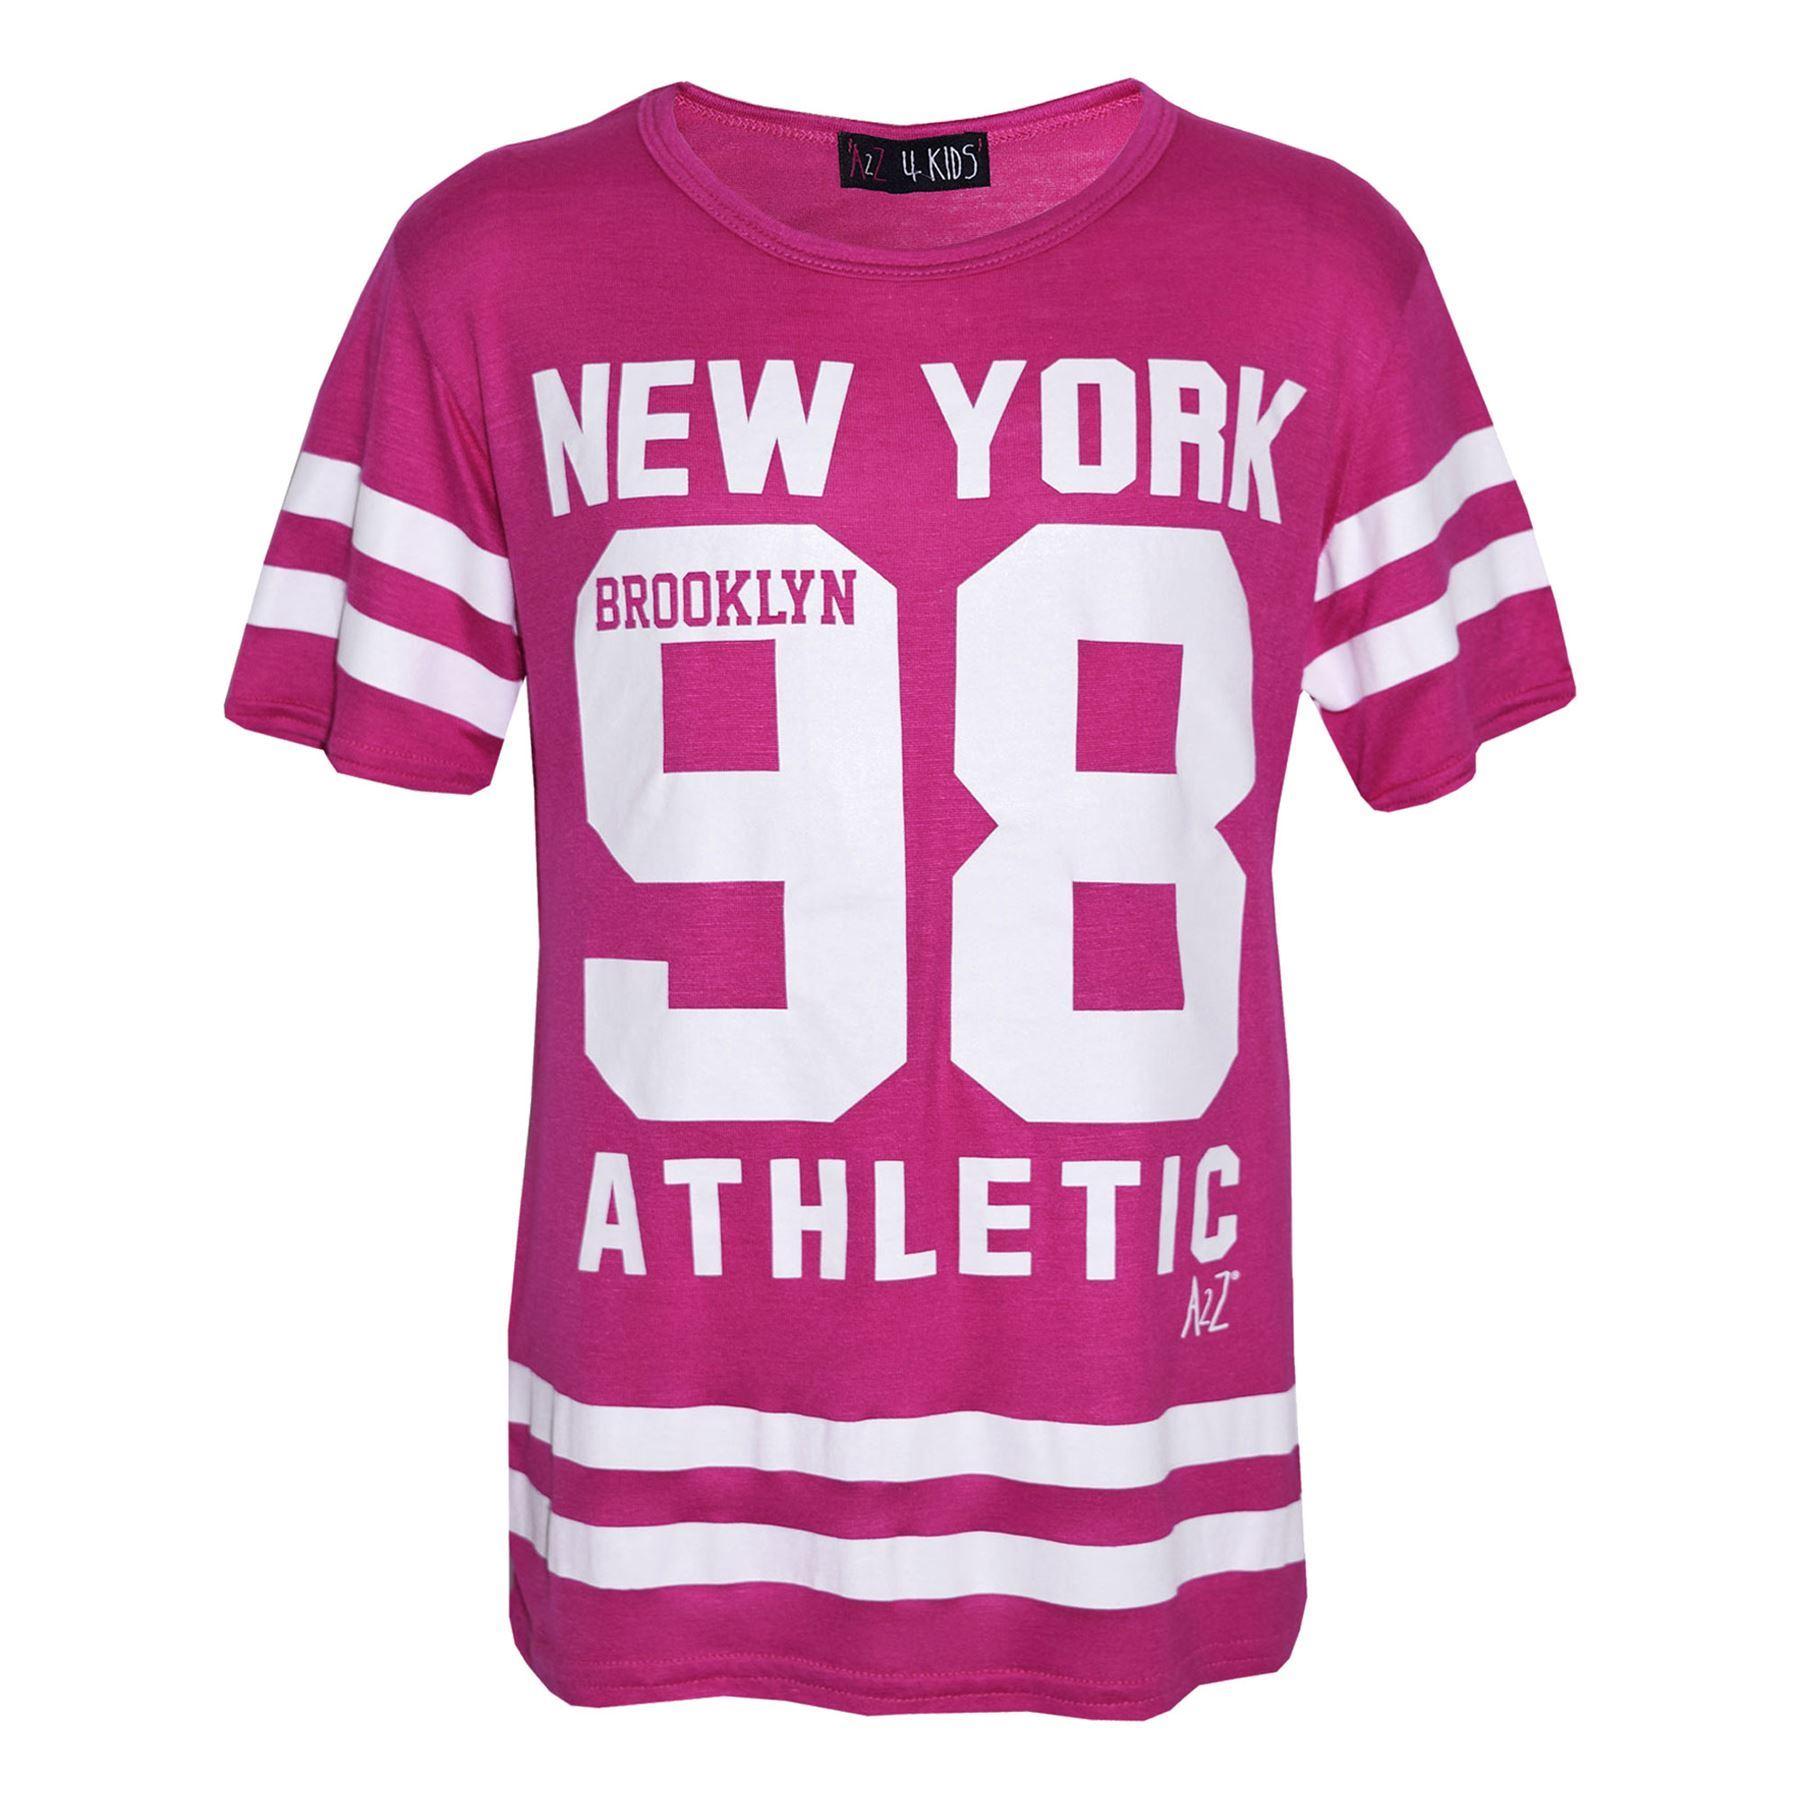 Girls-NEW-YORK-BROOKLYN-98-ATHLECTIC-Camouflage-Print-Top-amp-Legging-Set-7-13-Yr thumbnail 75